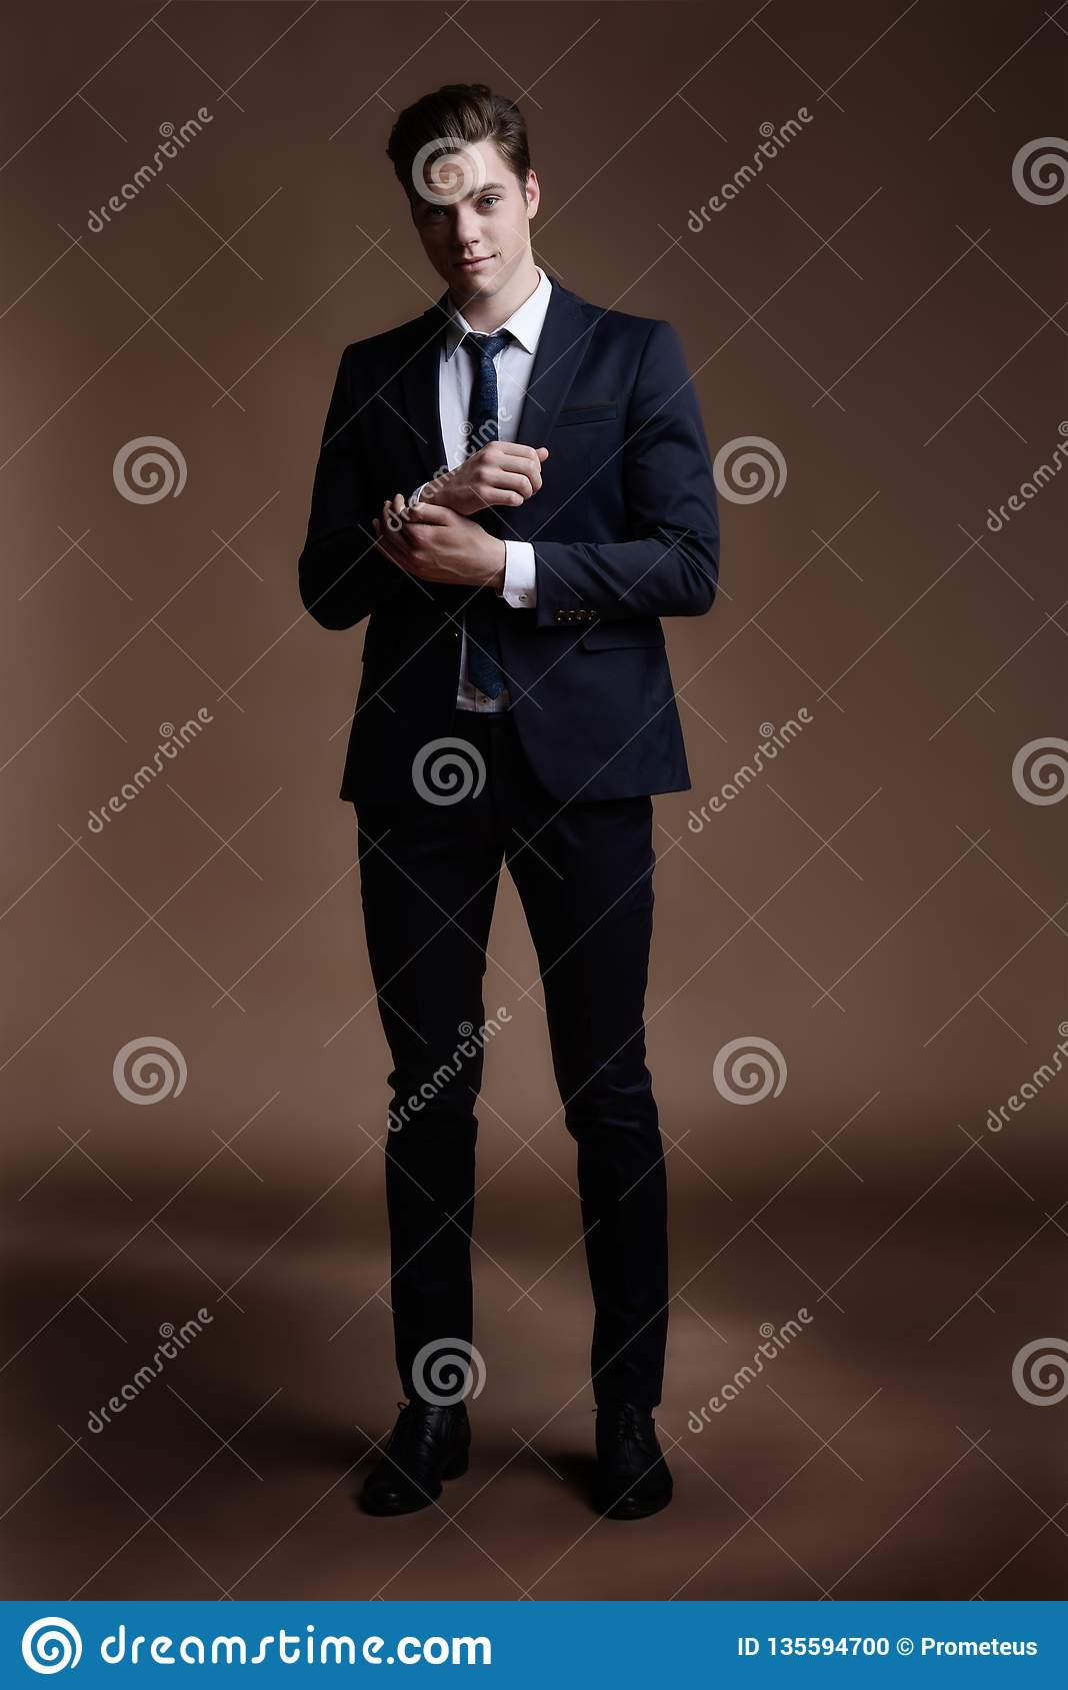 Elegant suit for dandy